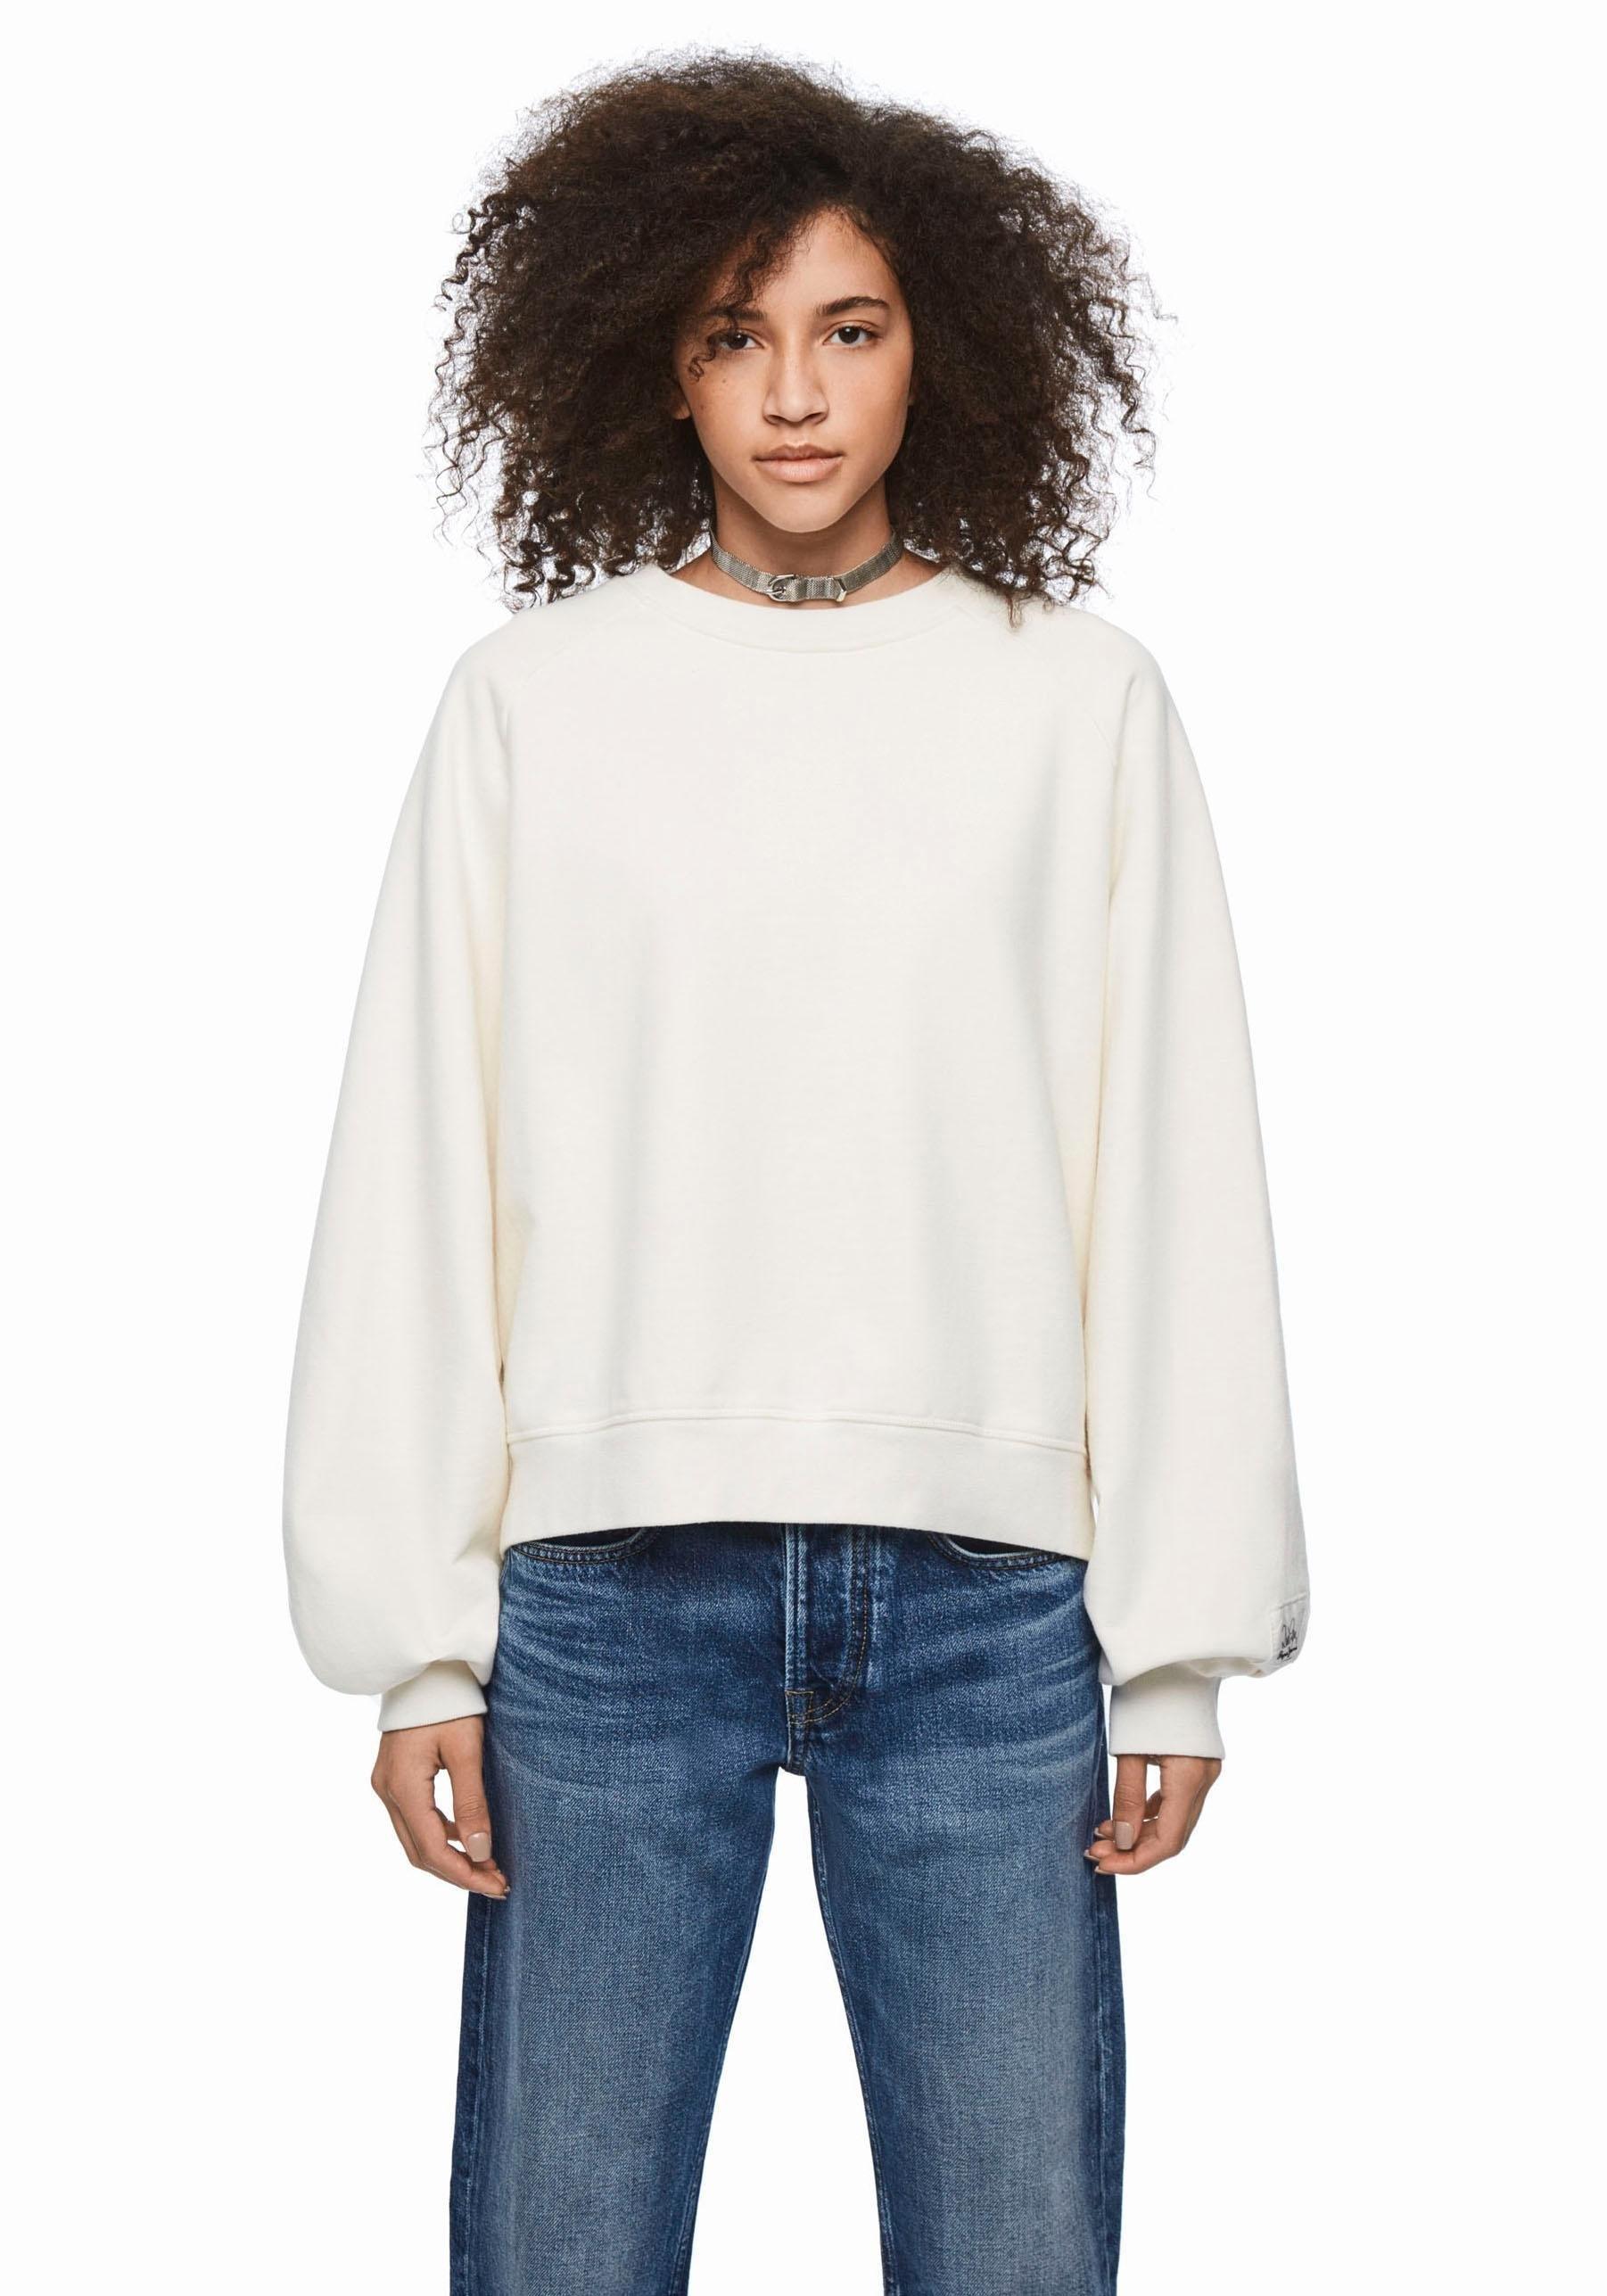 Pepe Jeans sweatshirt »LIDIA DUA LIPA X PEPE JEANS« bestellen: 14 dagen bedenktijd